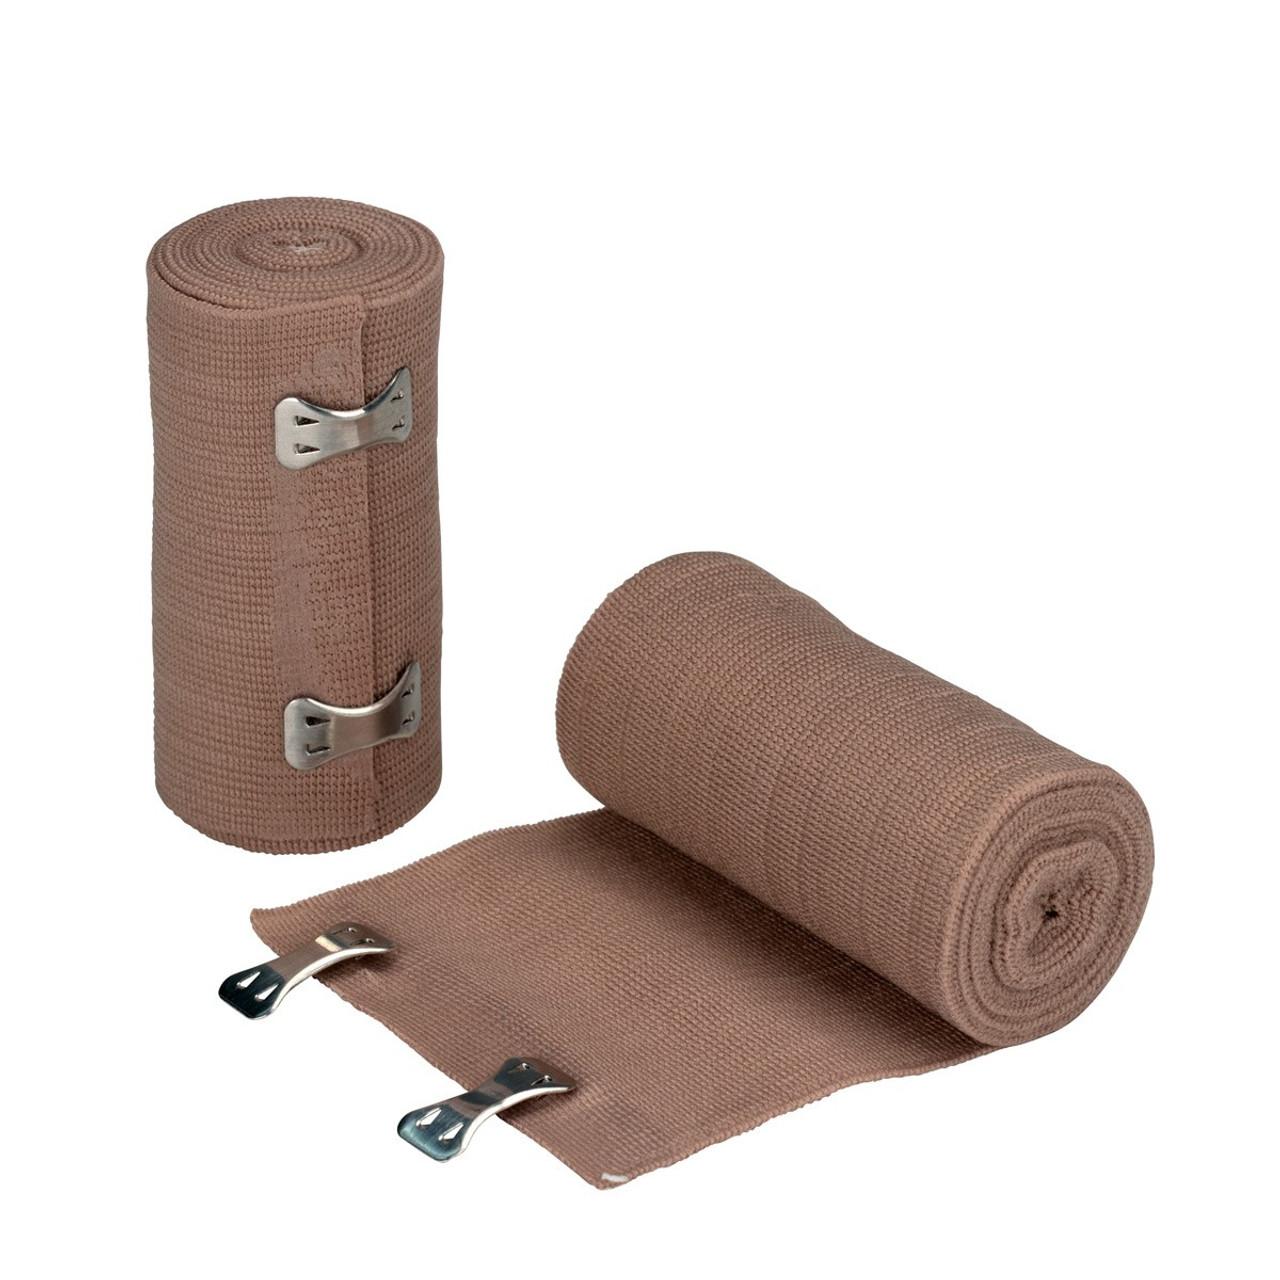 4 X5 Yd Elastic Bandage Wrap 5 903 First Industrial Supplies